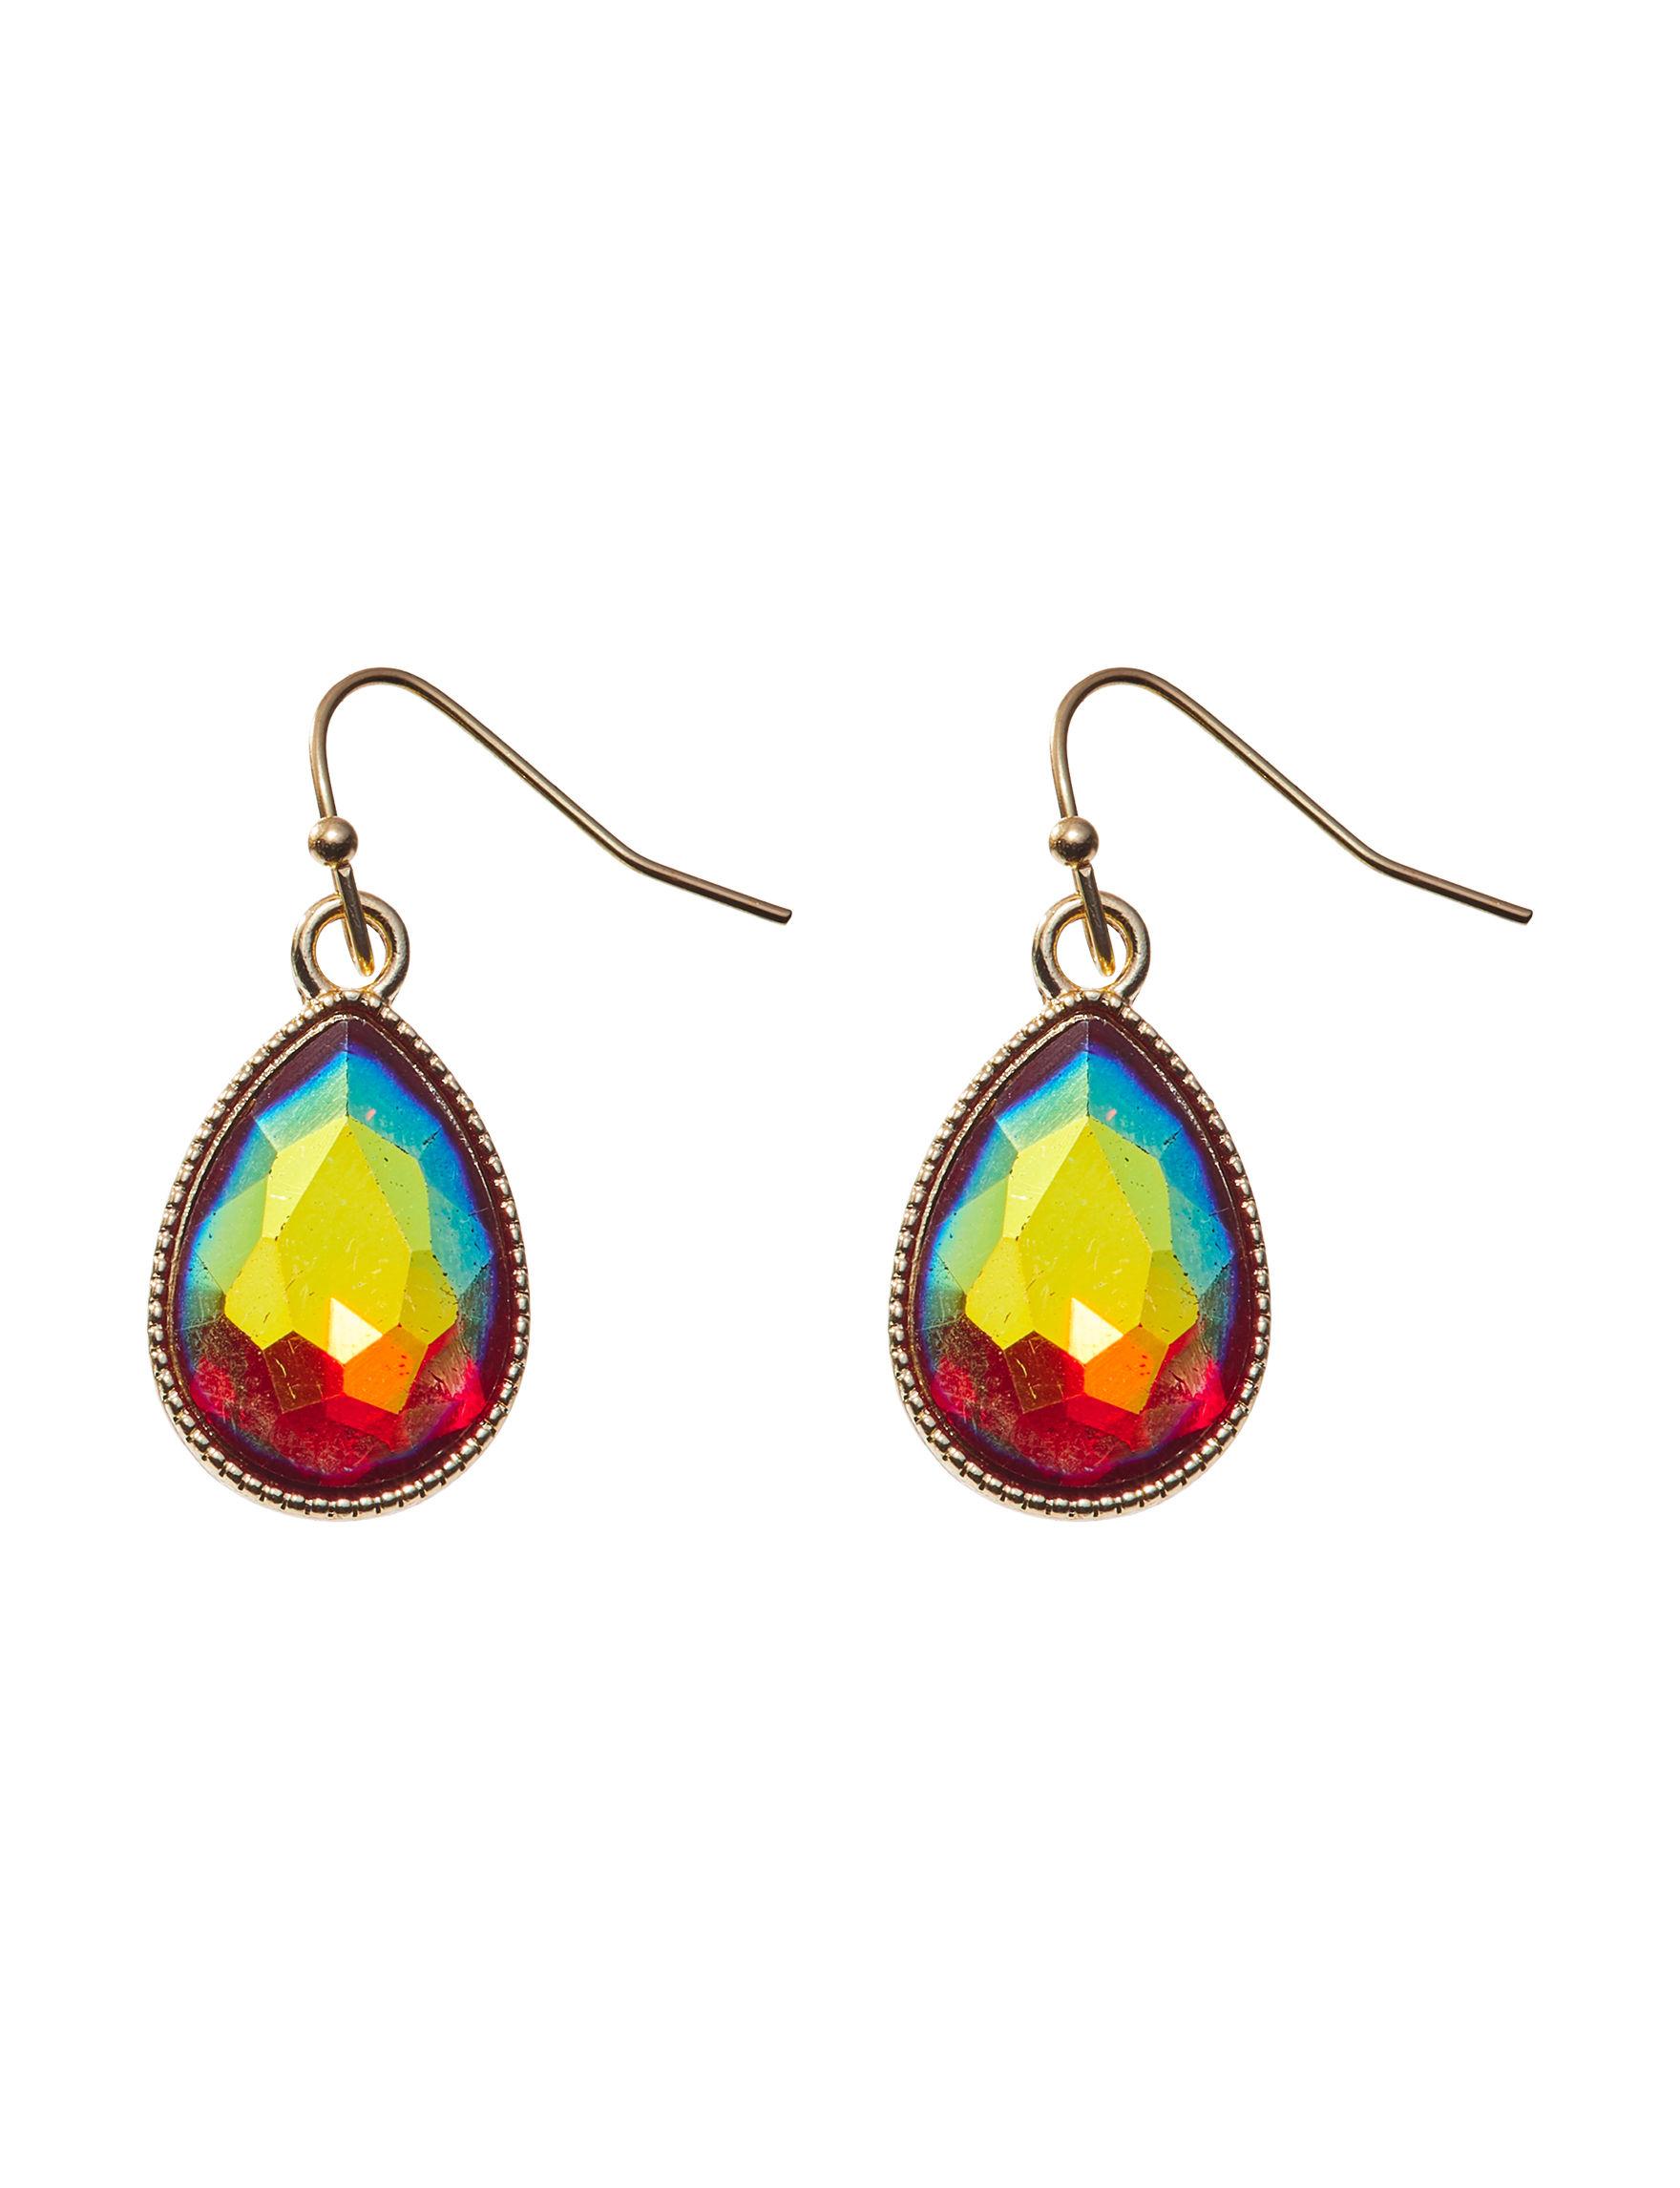 Hannah Gold / Stone Drops Earrings Fashion Jewelry